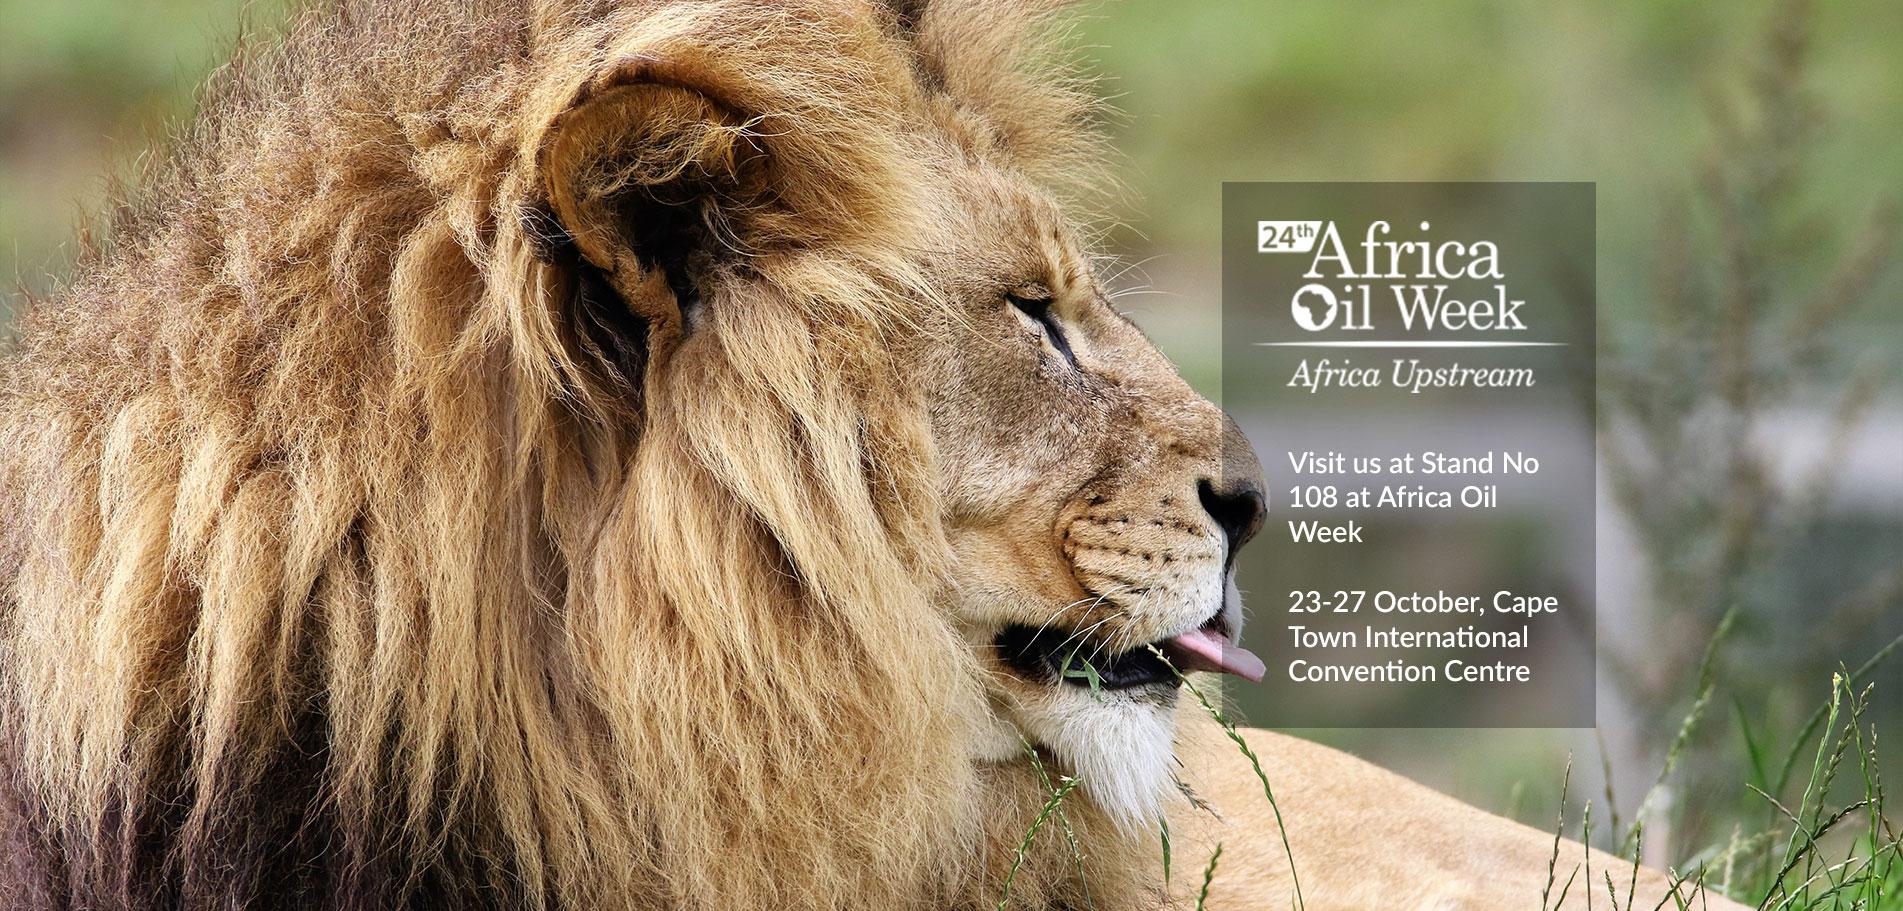 africa-oil-week-oct